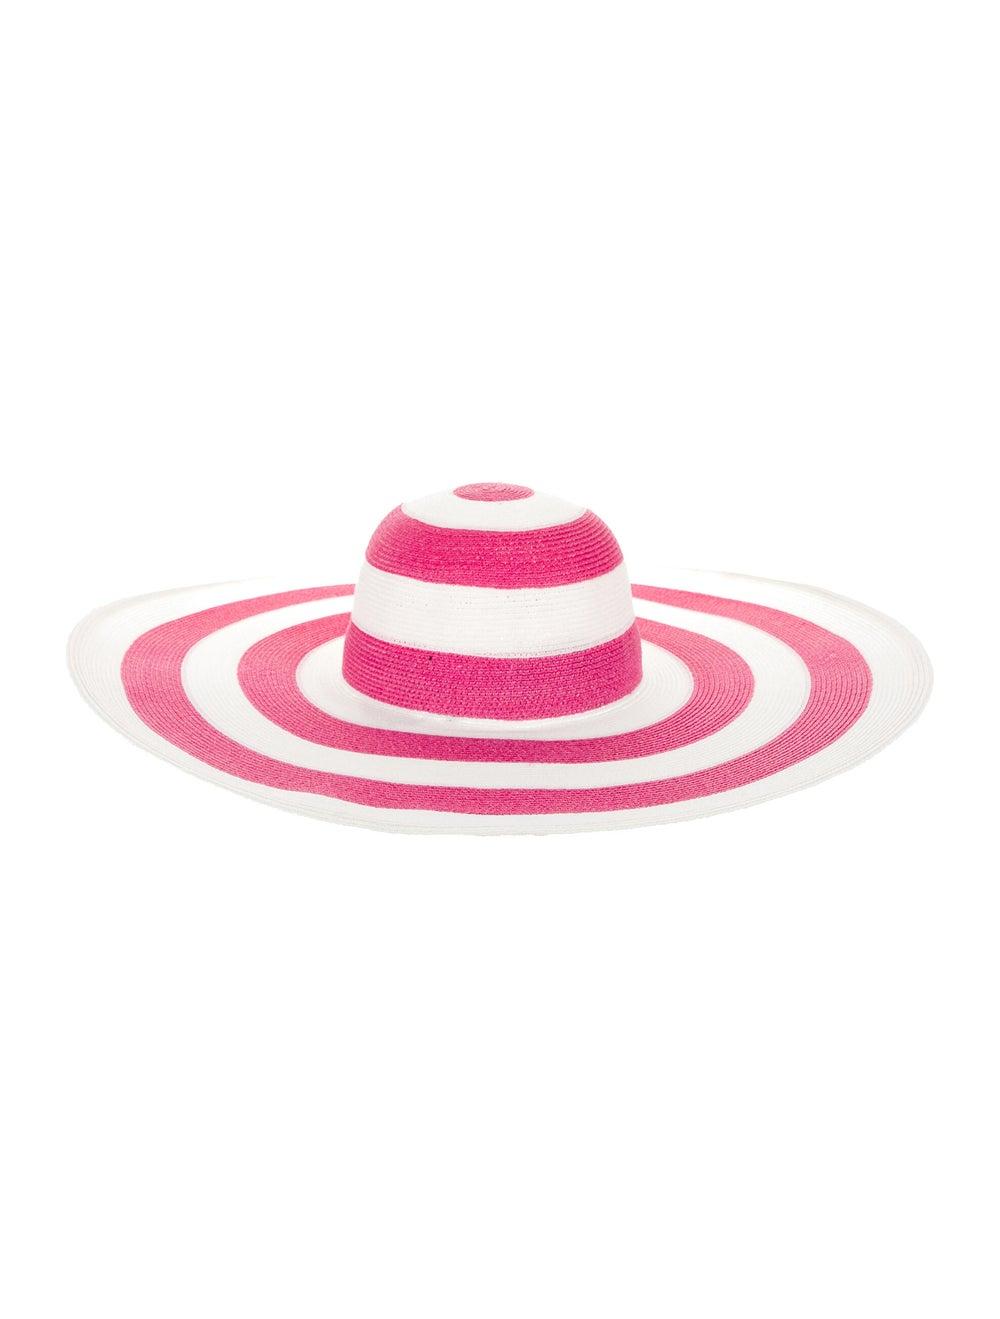 Eugenia Kim Straw Wide-Brim Hat Pink - image 2